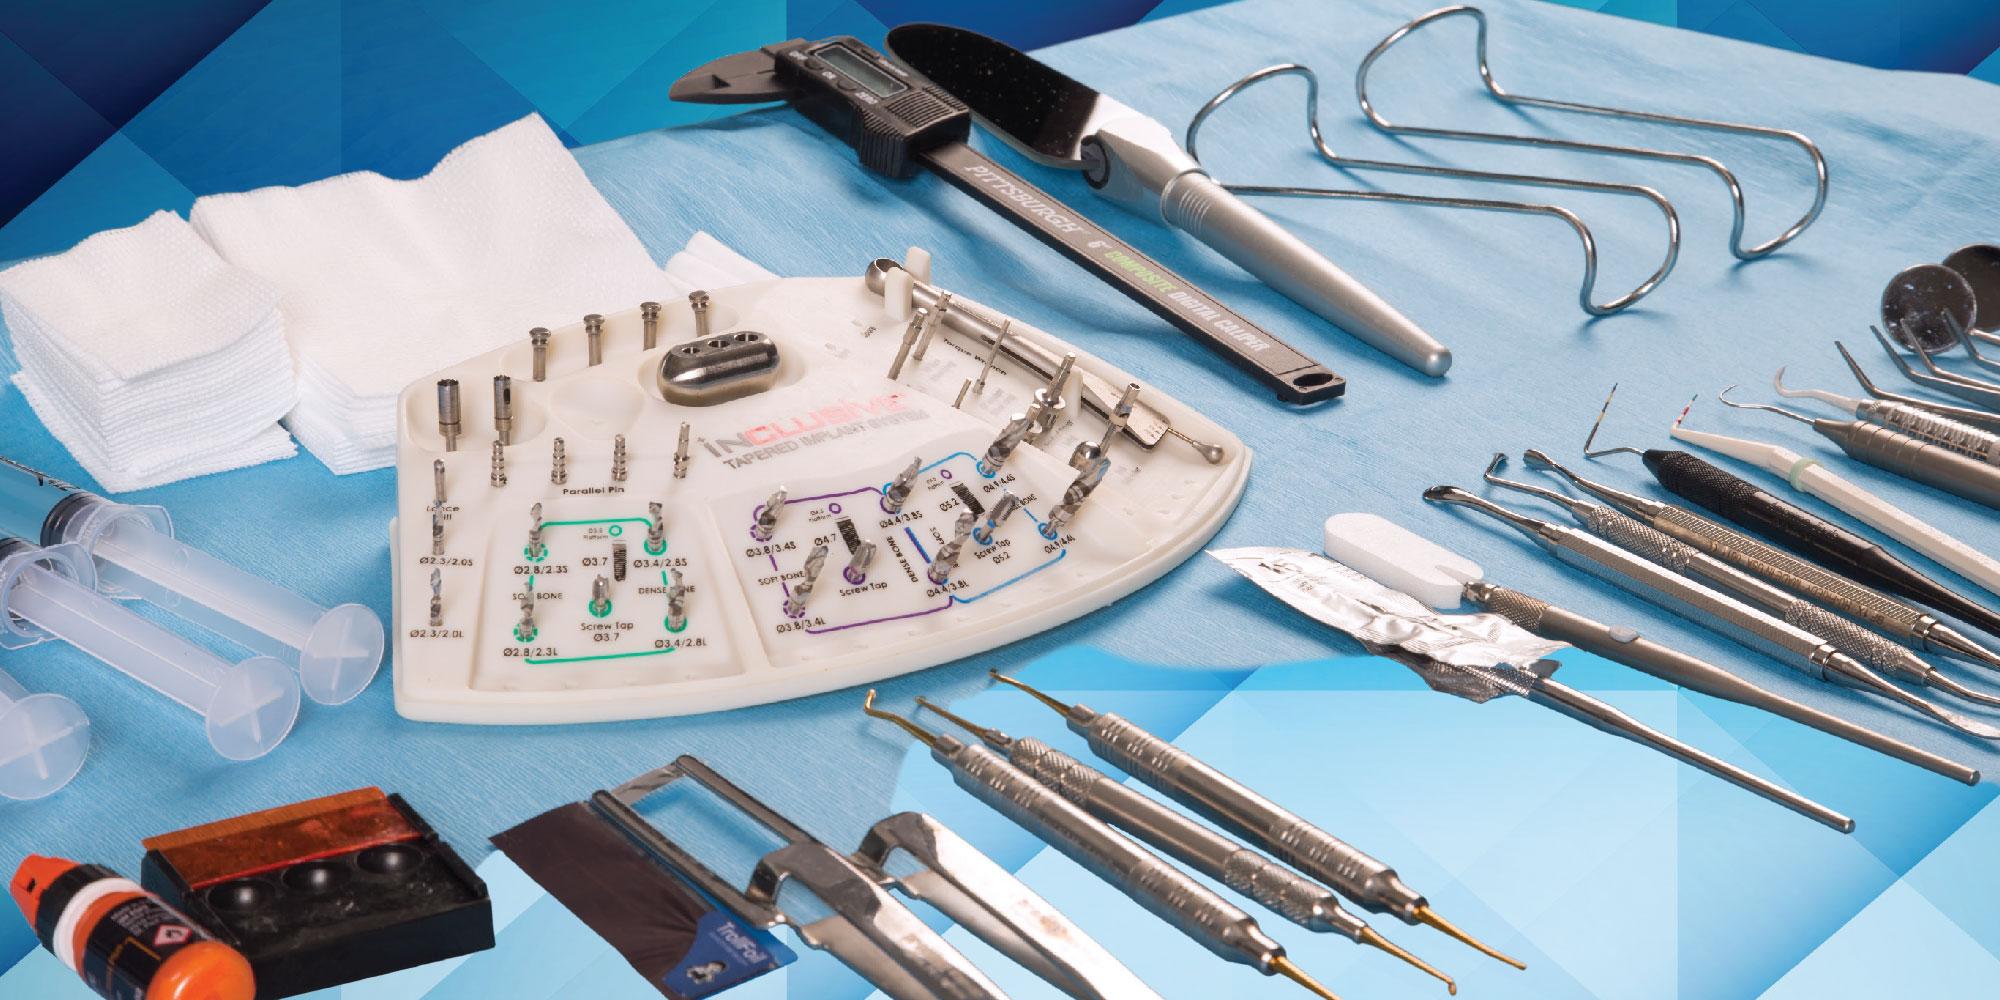 Practice Management: Basic Tray Setup for Dental Implant Surgery